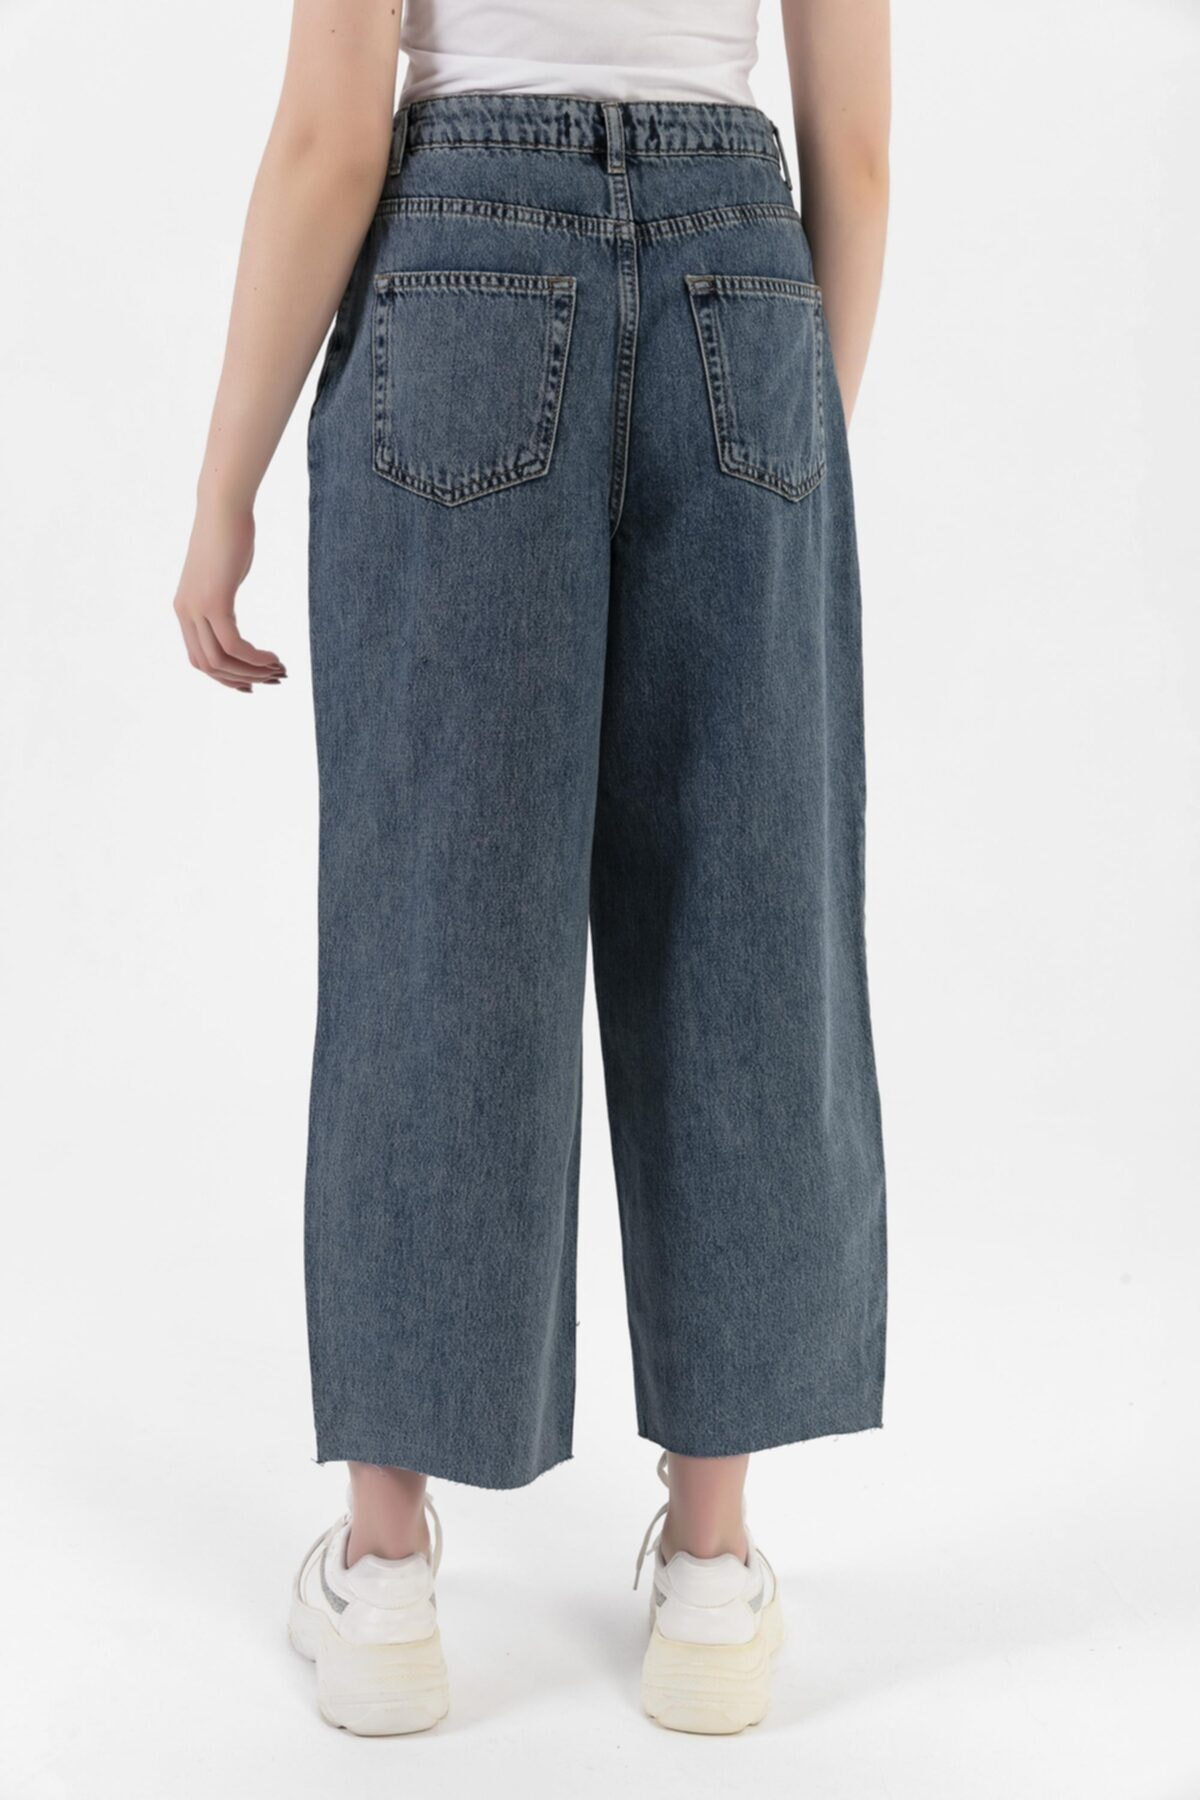 HerTon Paça Detaylı Pat Düğmeli Pliseli Kot Pantolon 117-0080